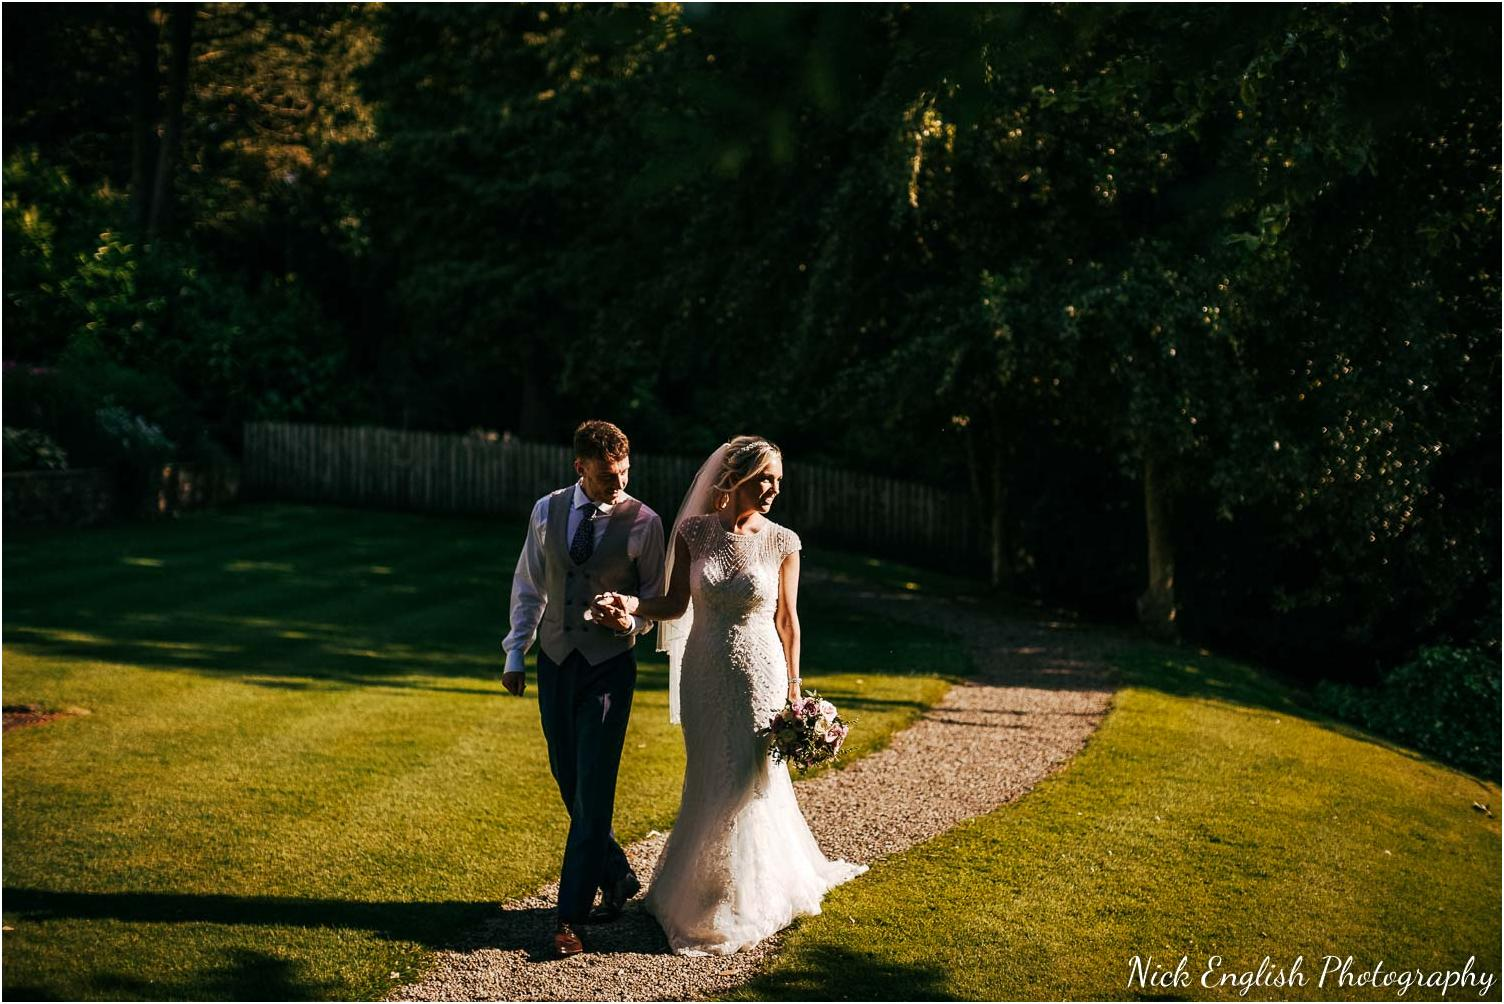 Mitton_Hall_Wedding_Photograph-144.jpg